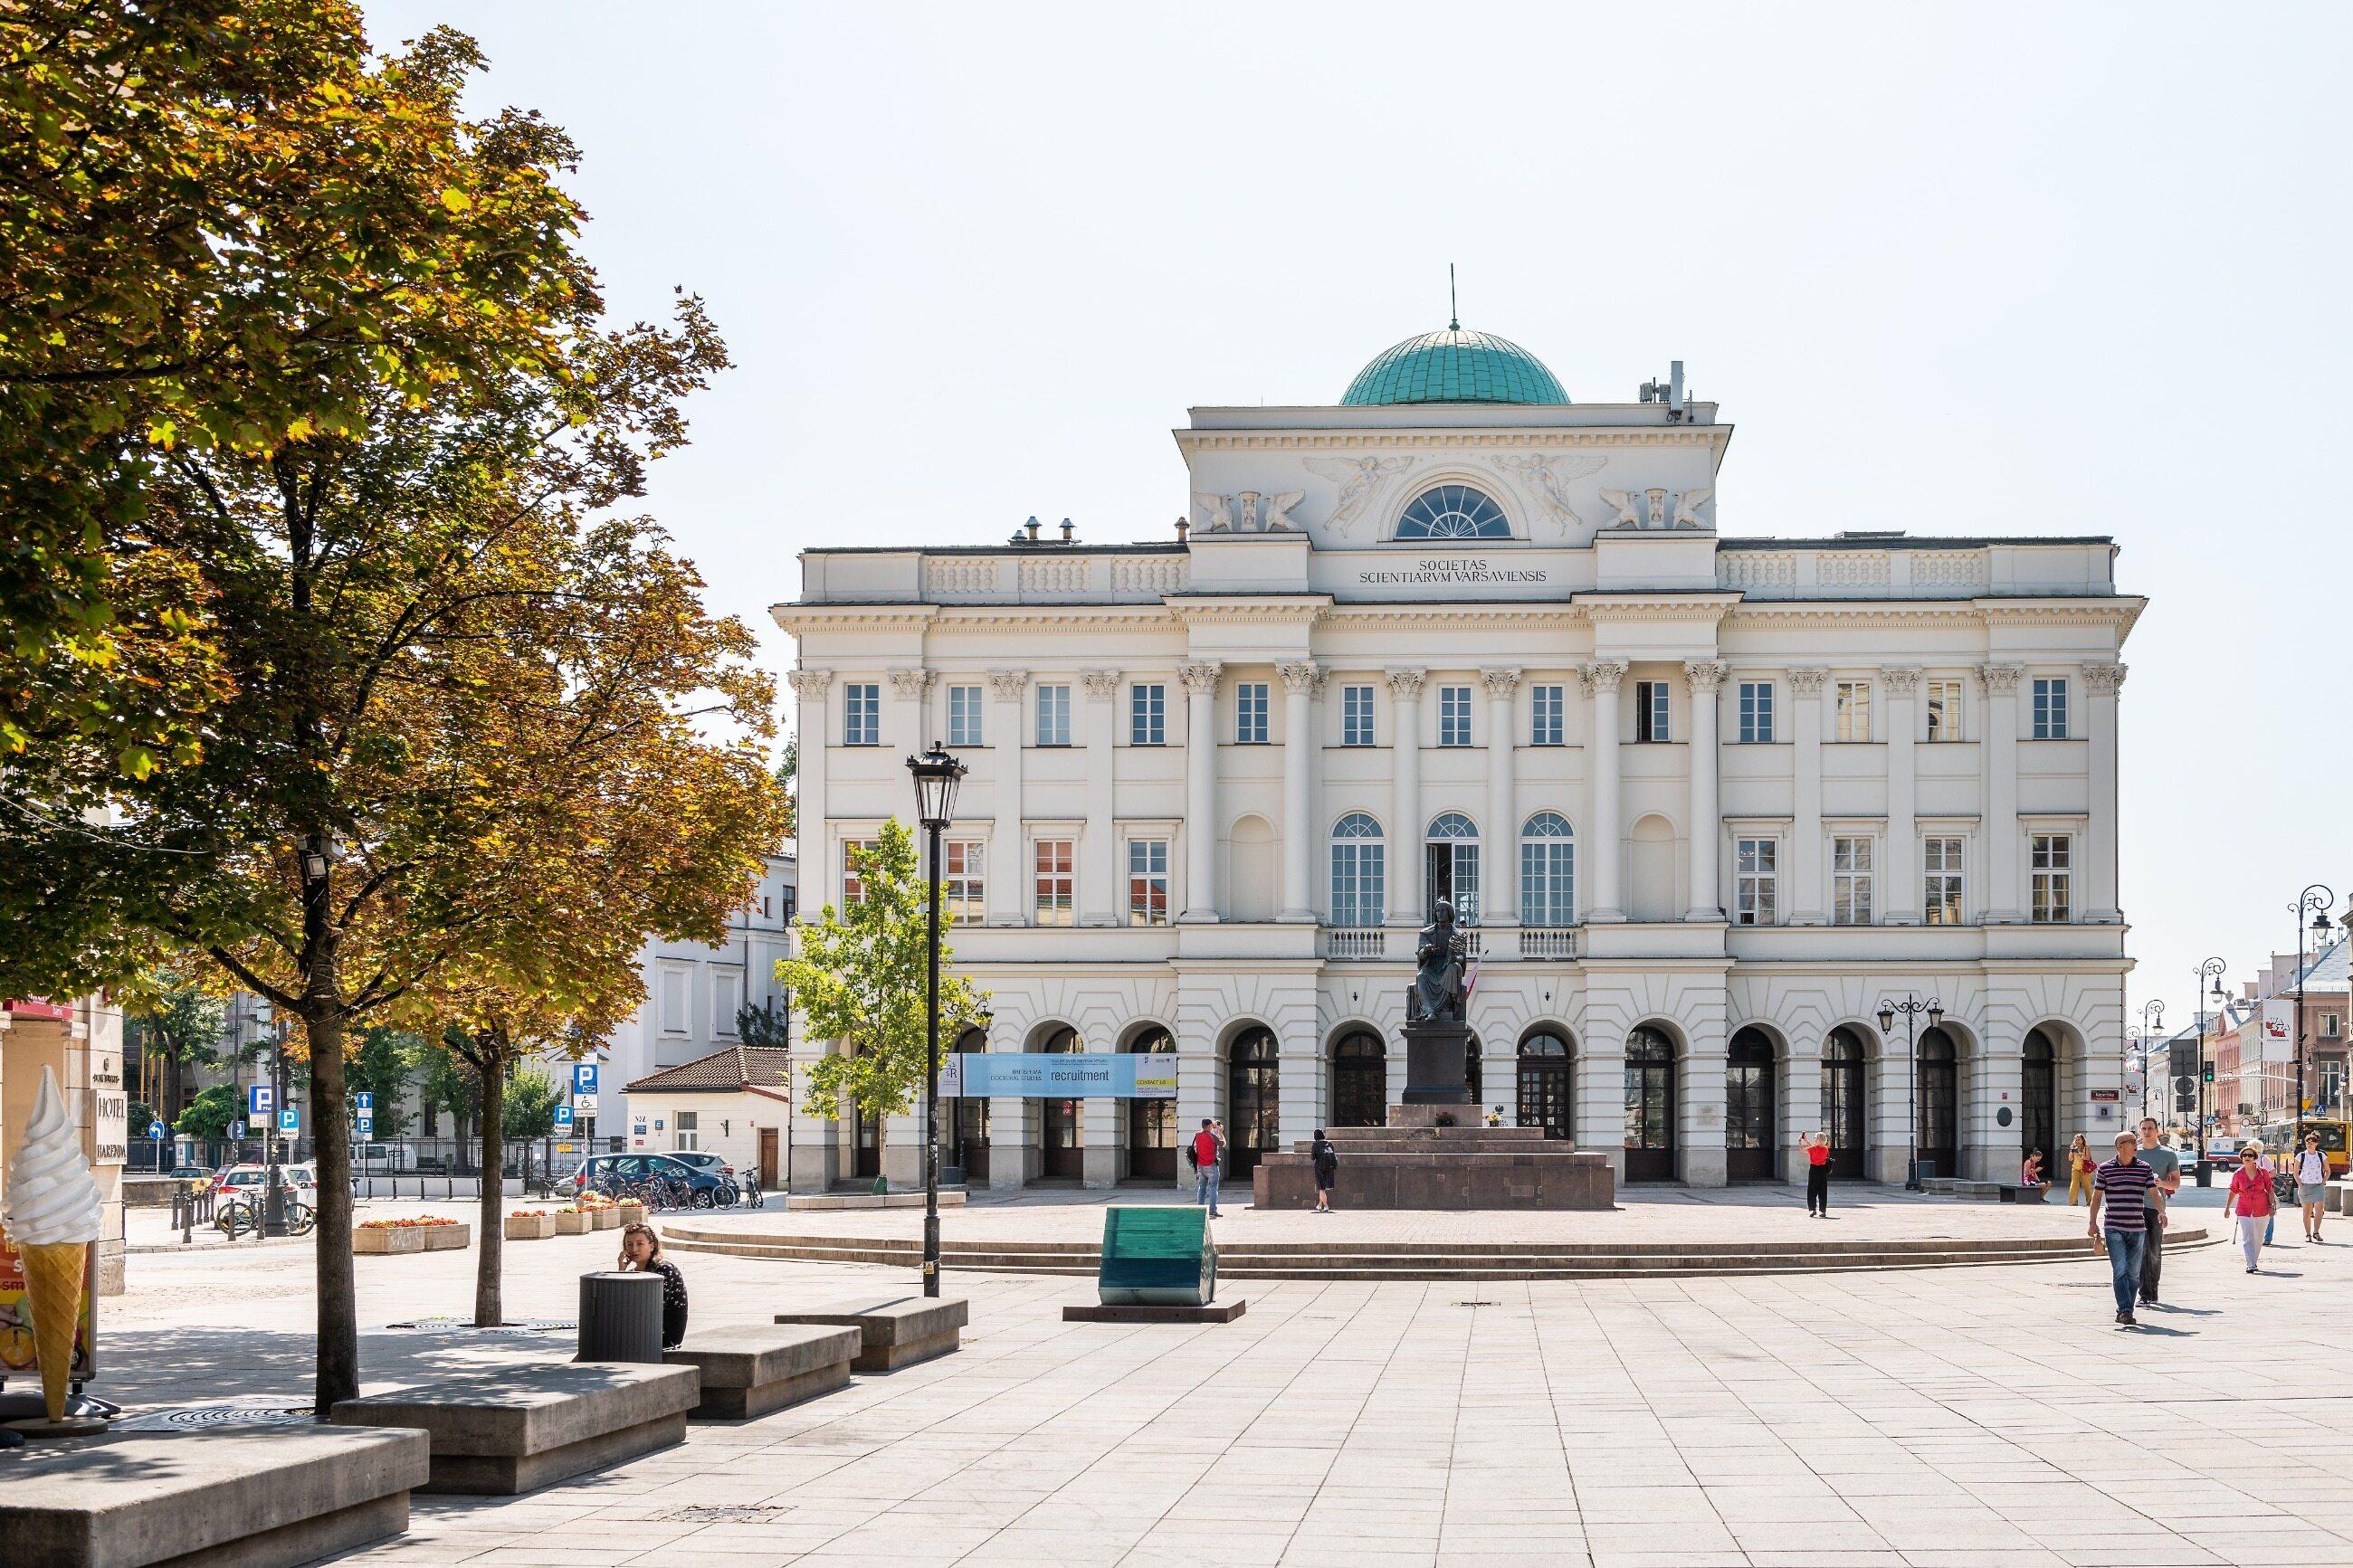 Siedziba Polskiej Akademii Nauk (PAN)